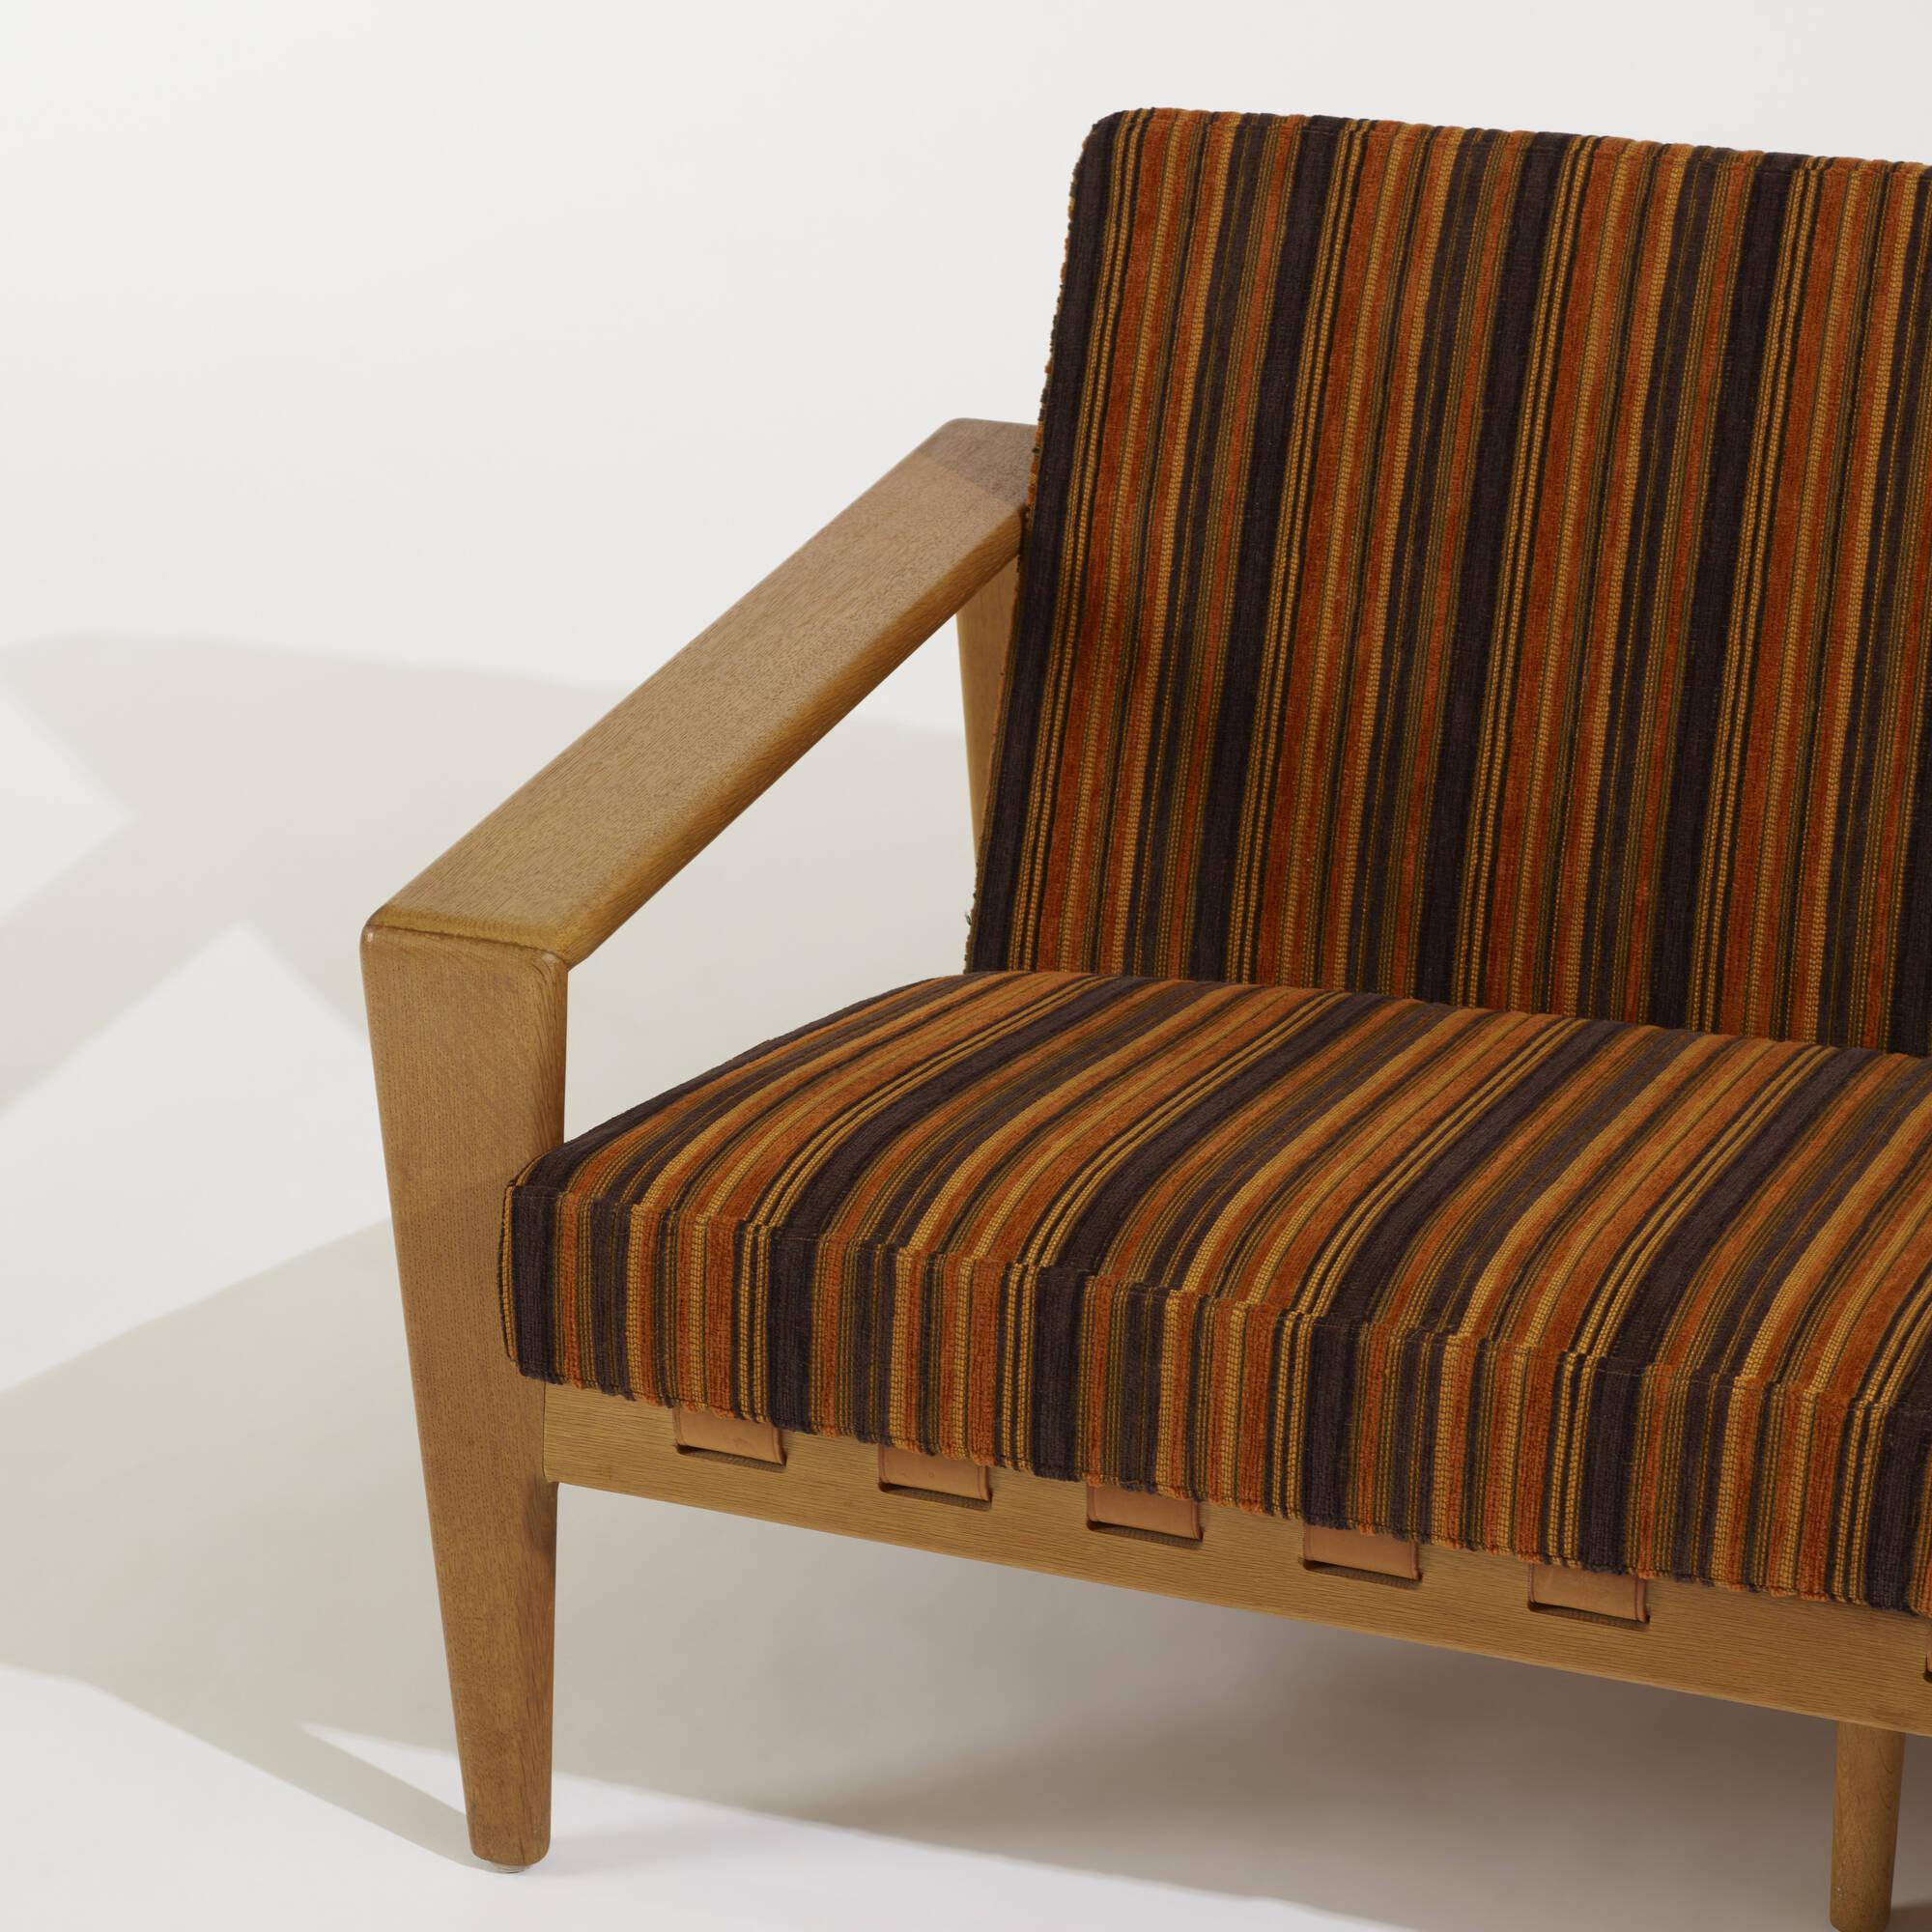 164: Svante Skogh / sofa (3 of 4)